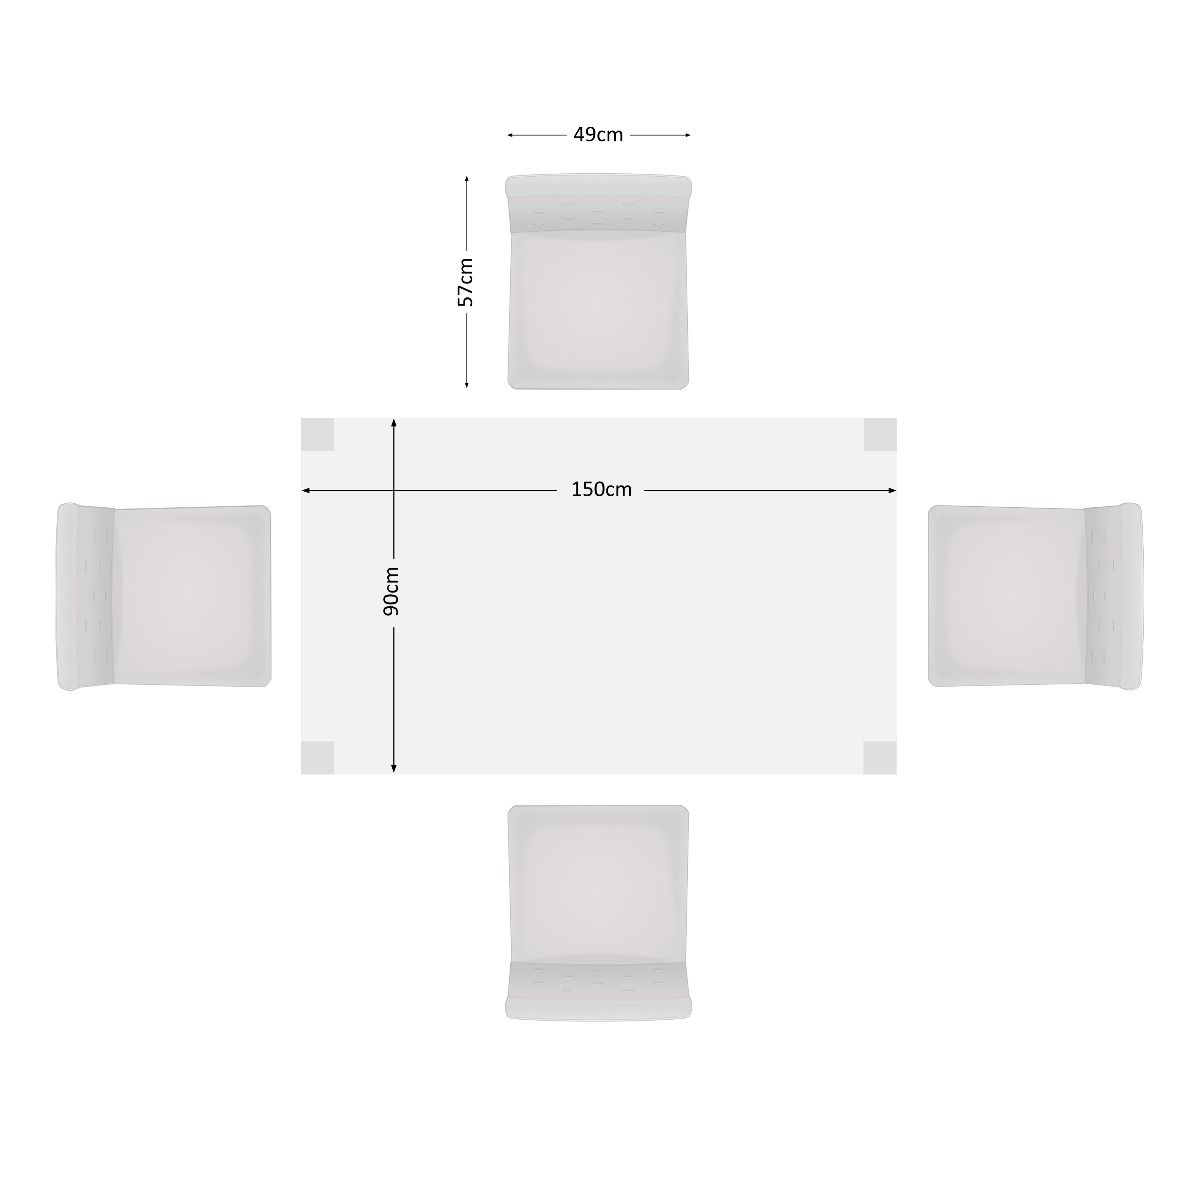 Dimension Image